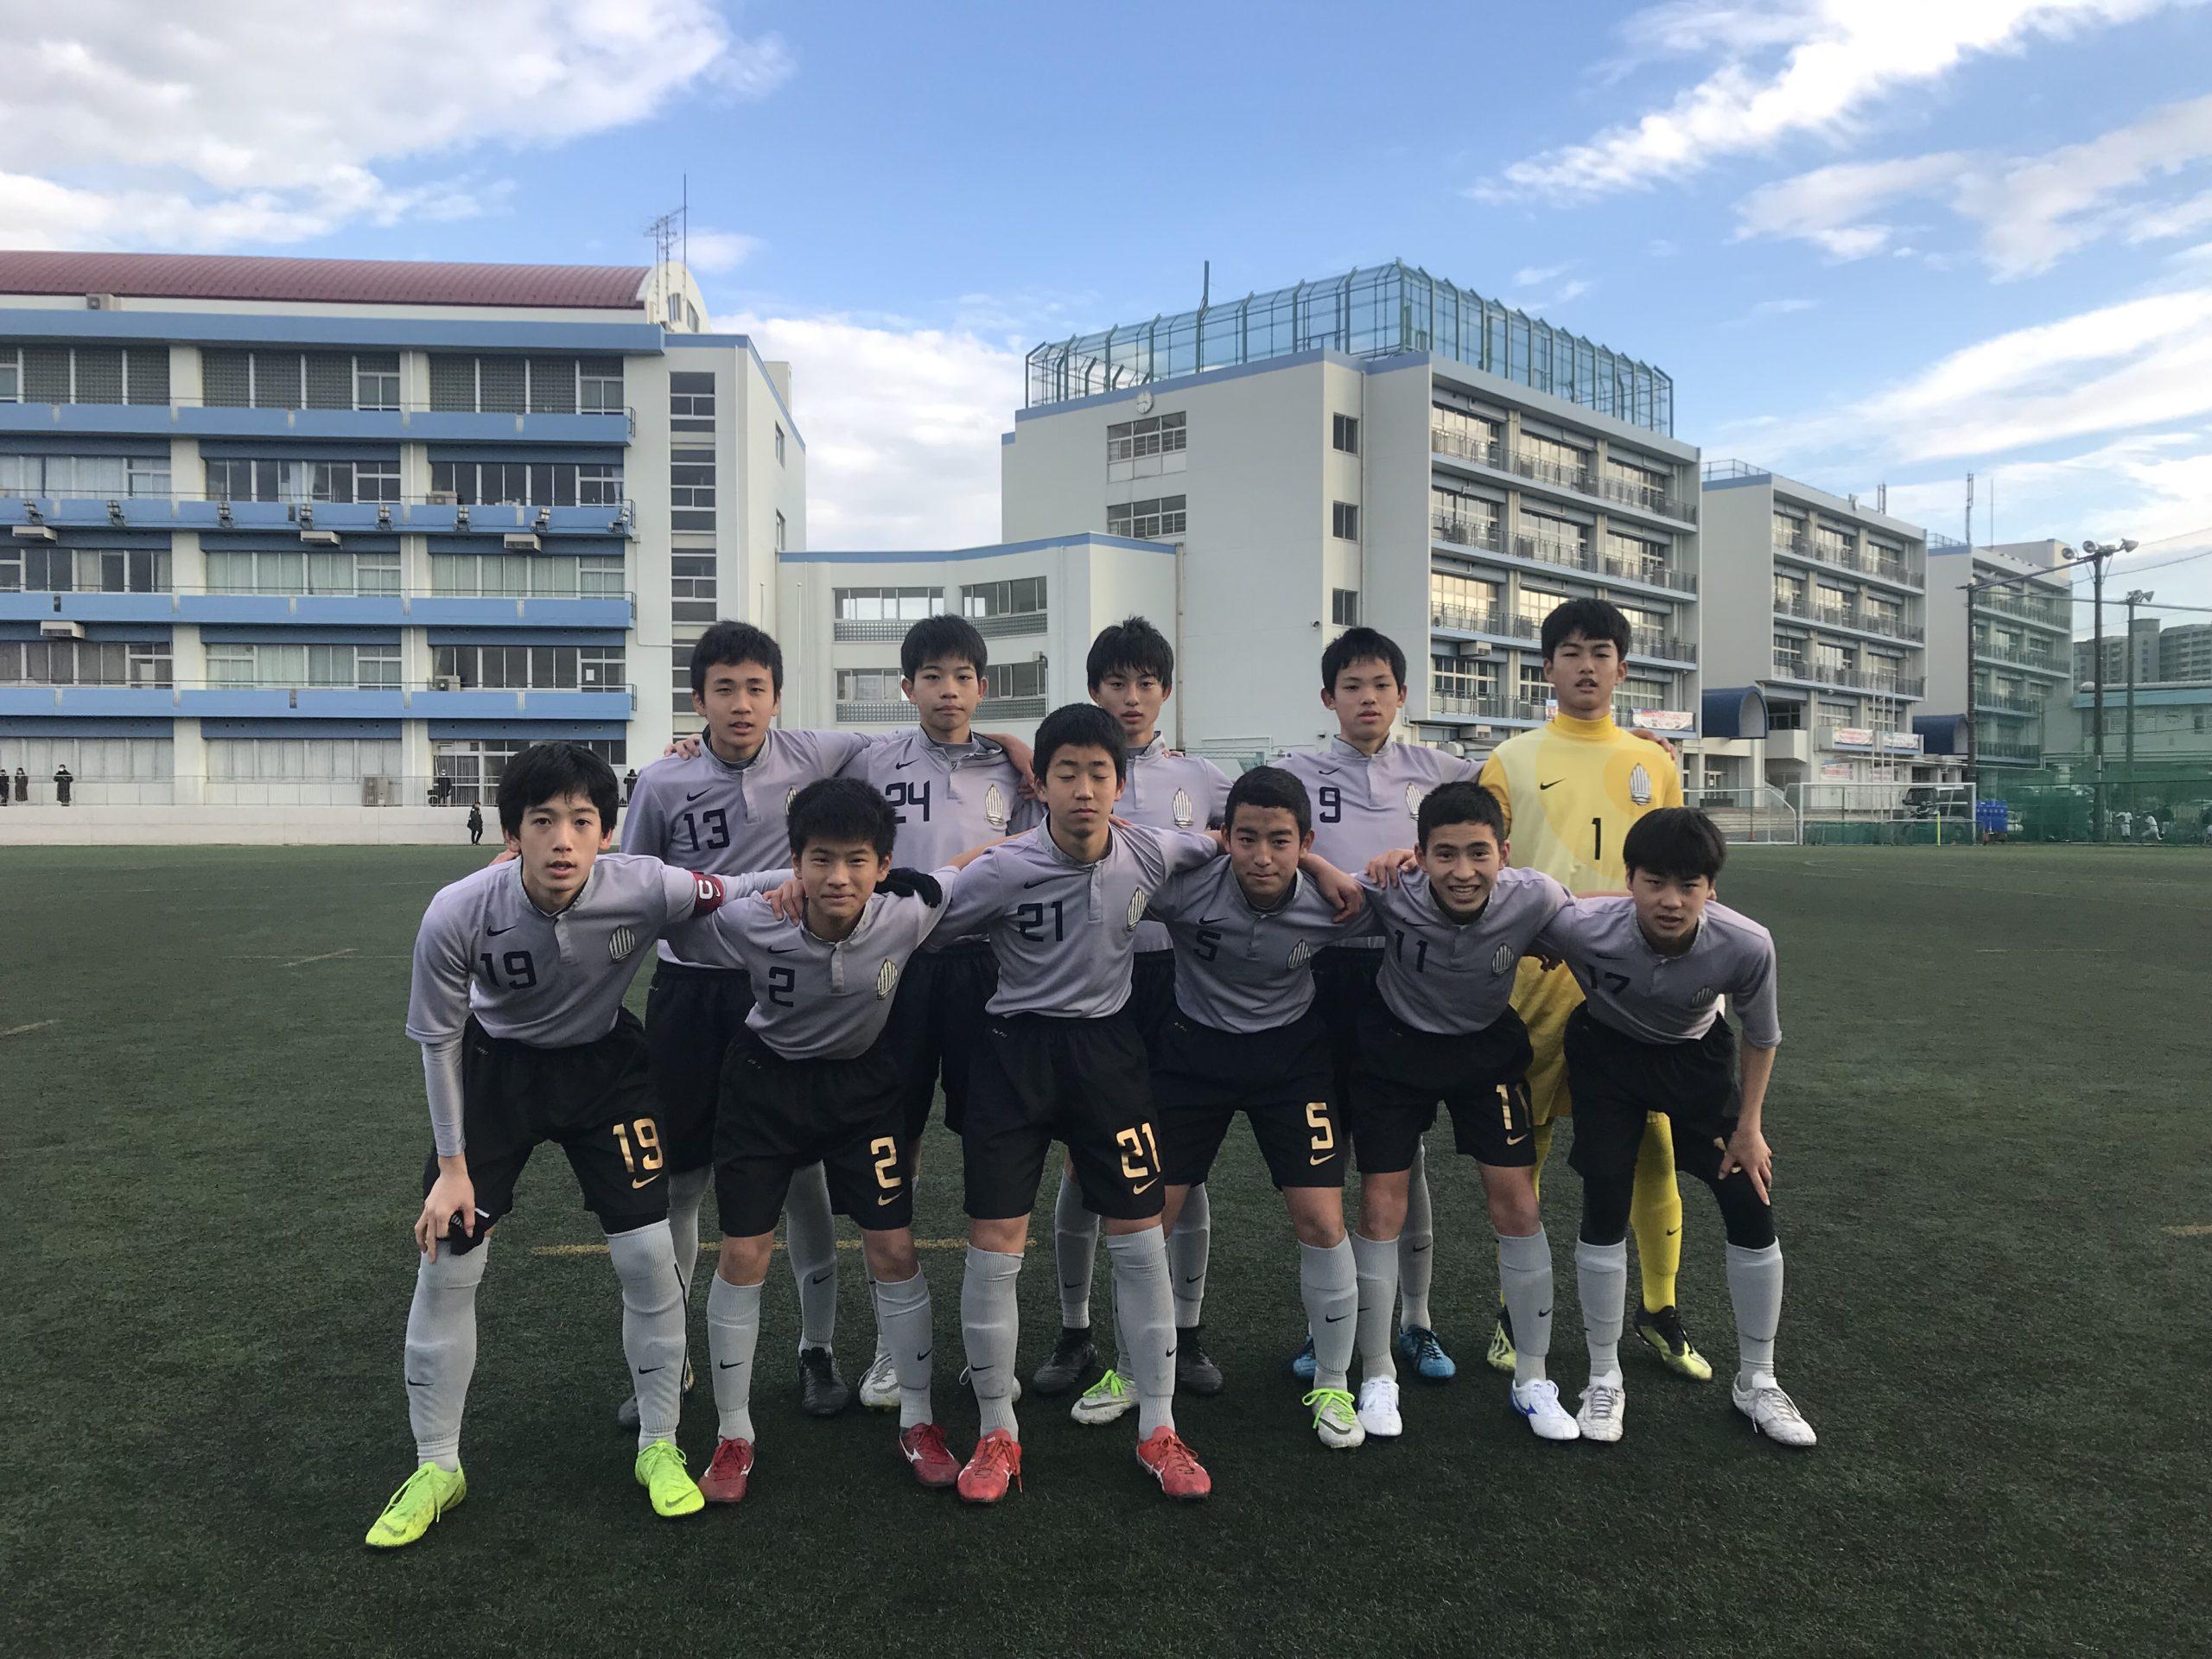 【U15】高円宮杯 U-15サッカー千葉県1部リーグ 第3節